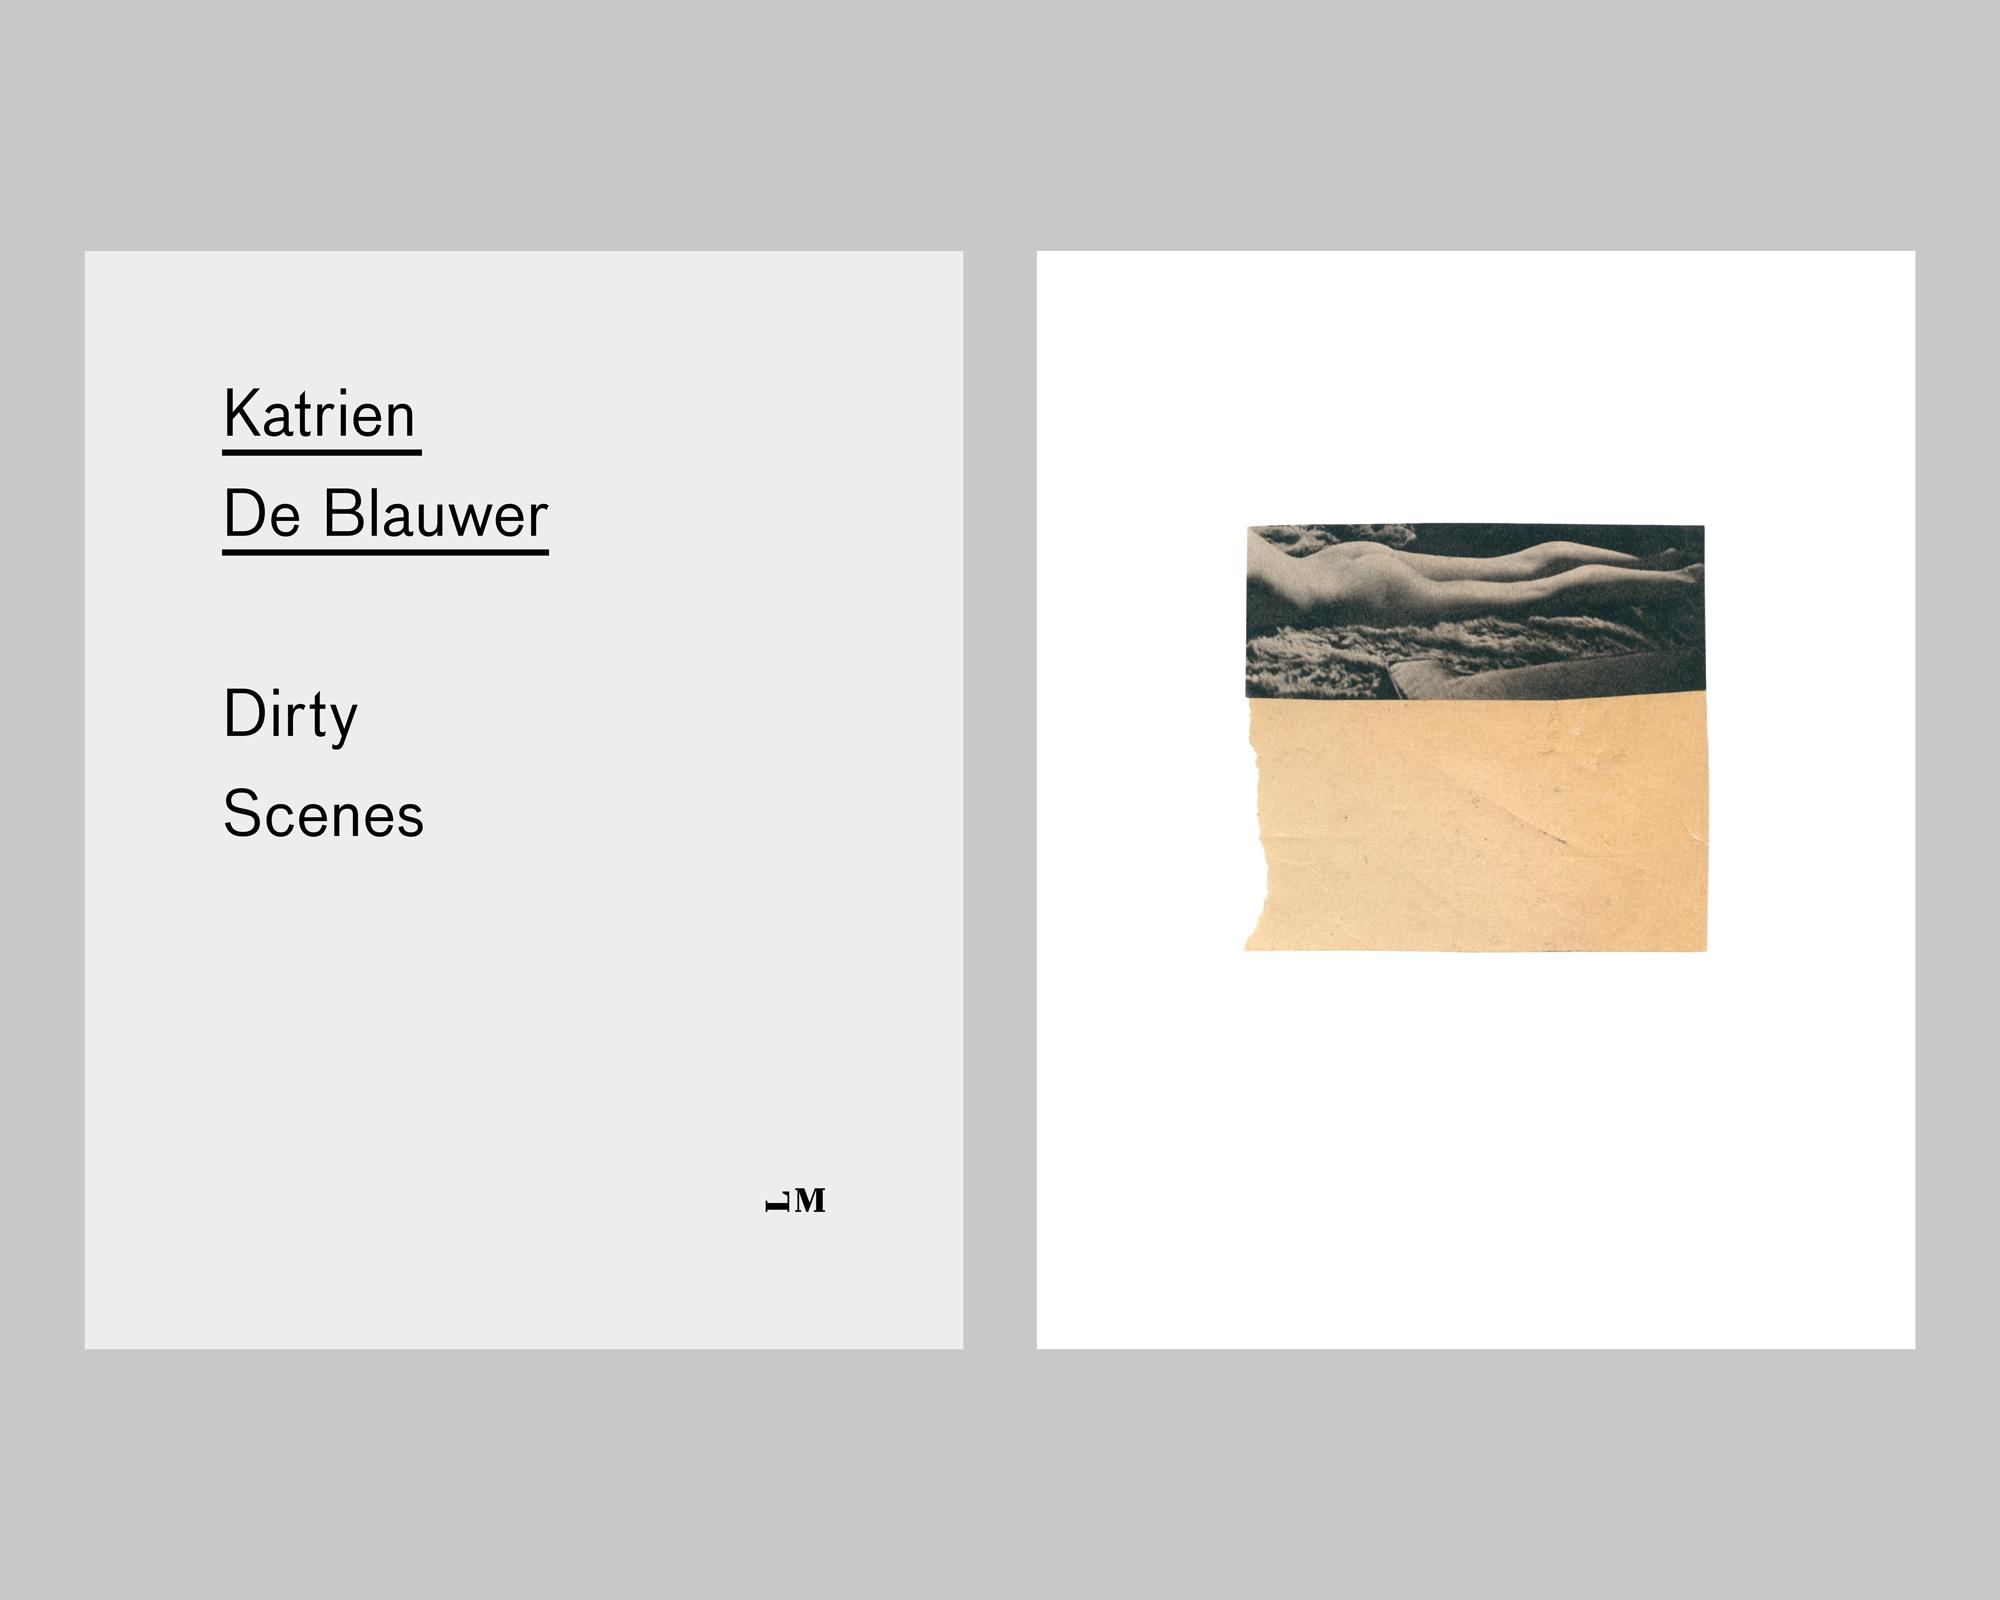 LM-Katrien-De-Blauwer-Dirty-Scenes-01.jpg